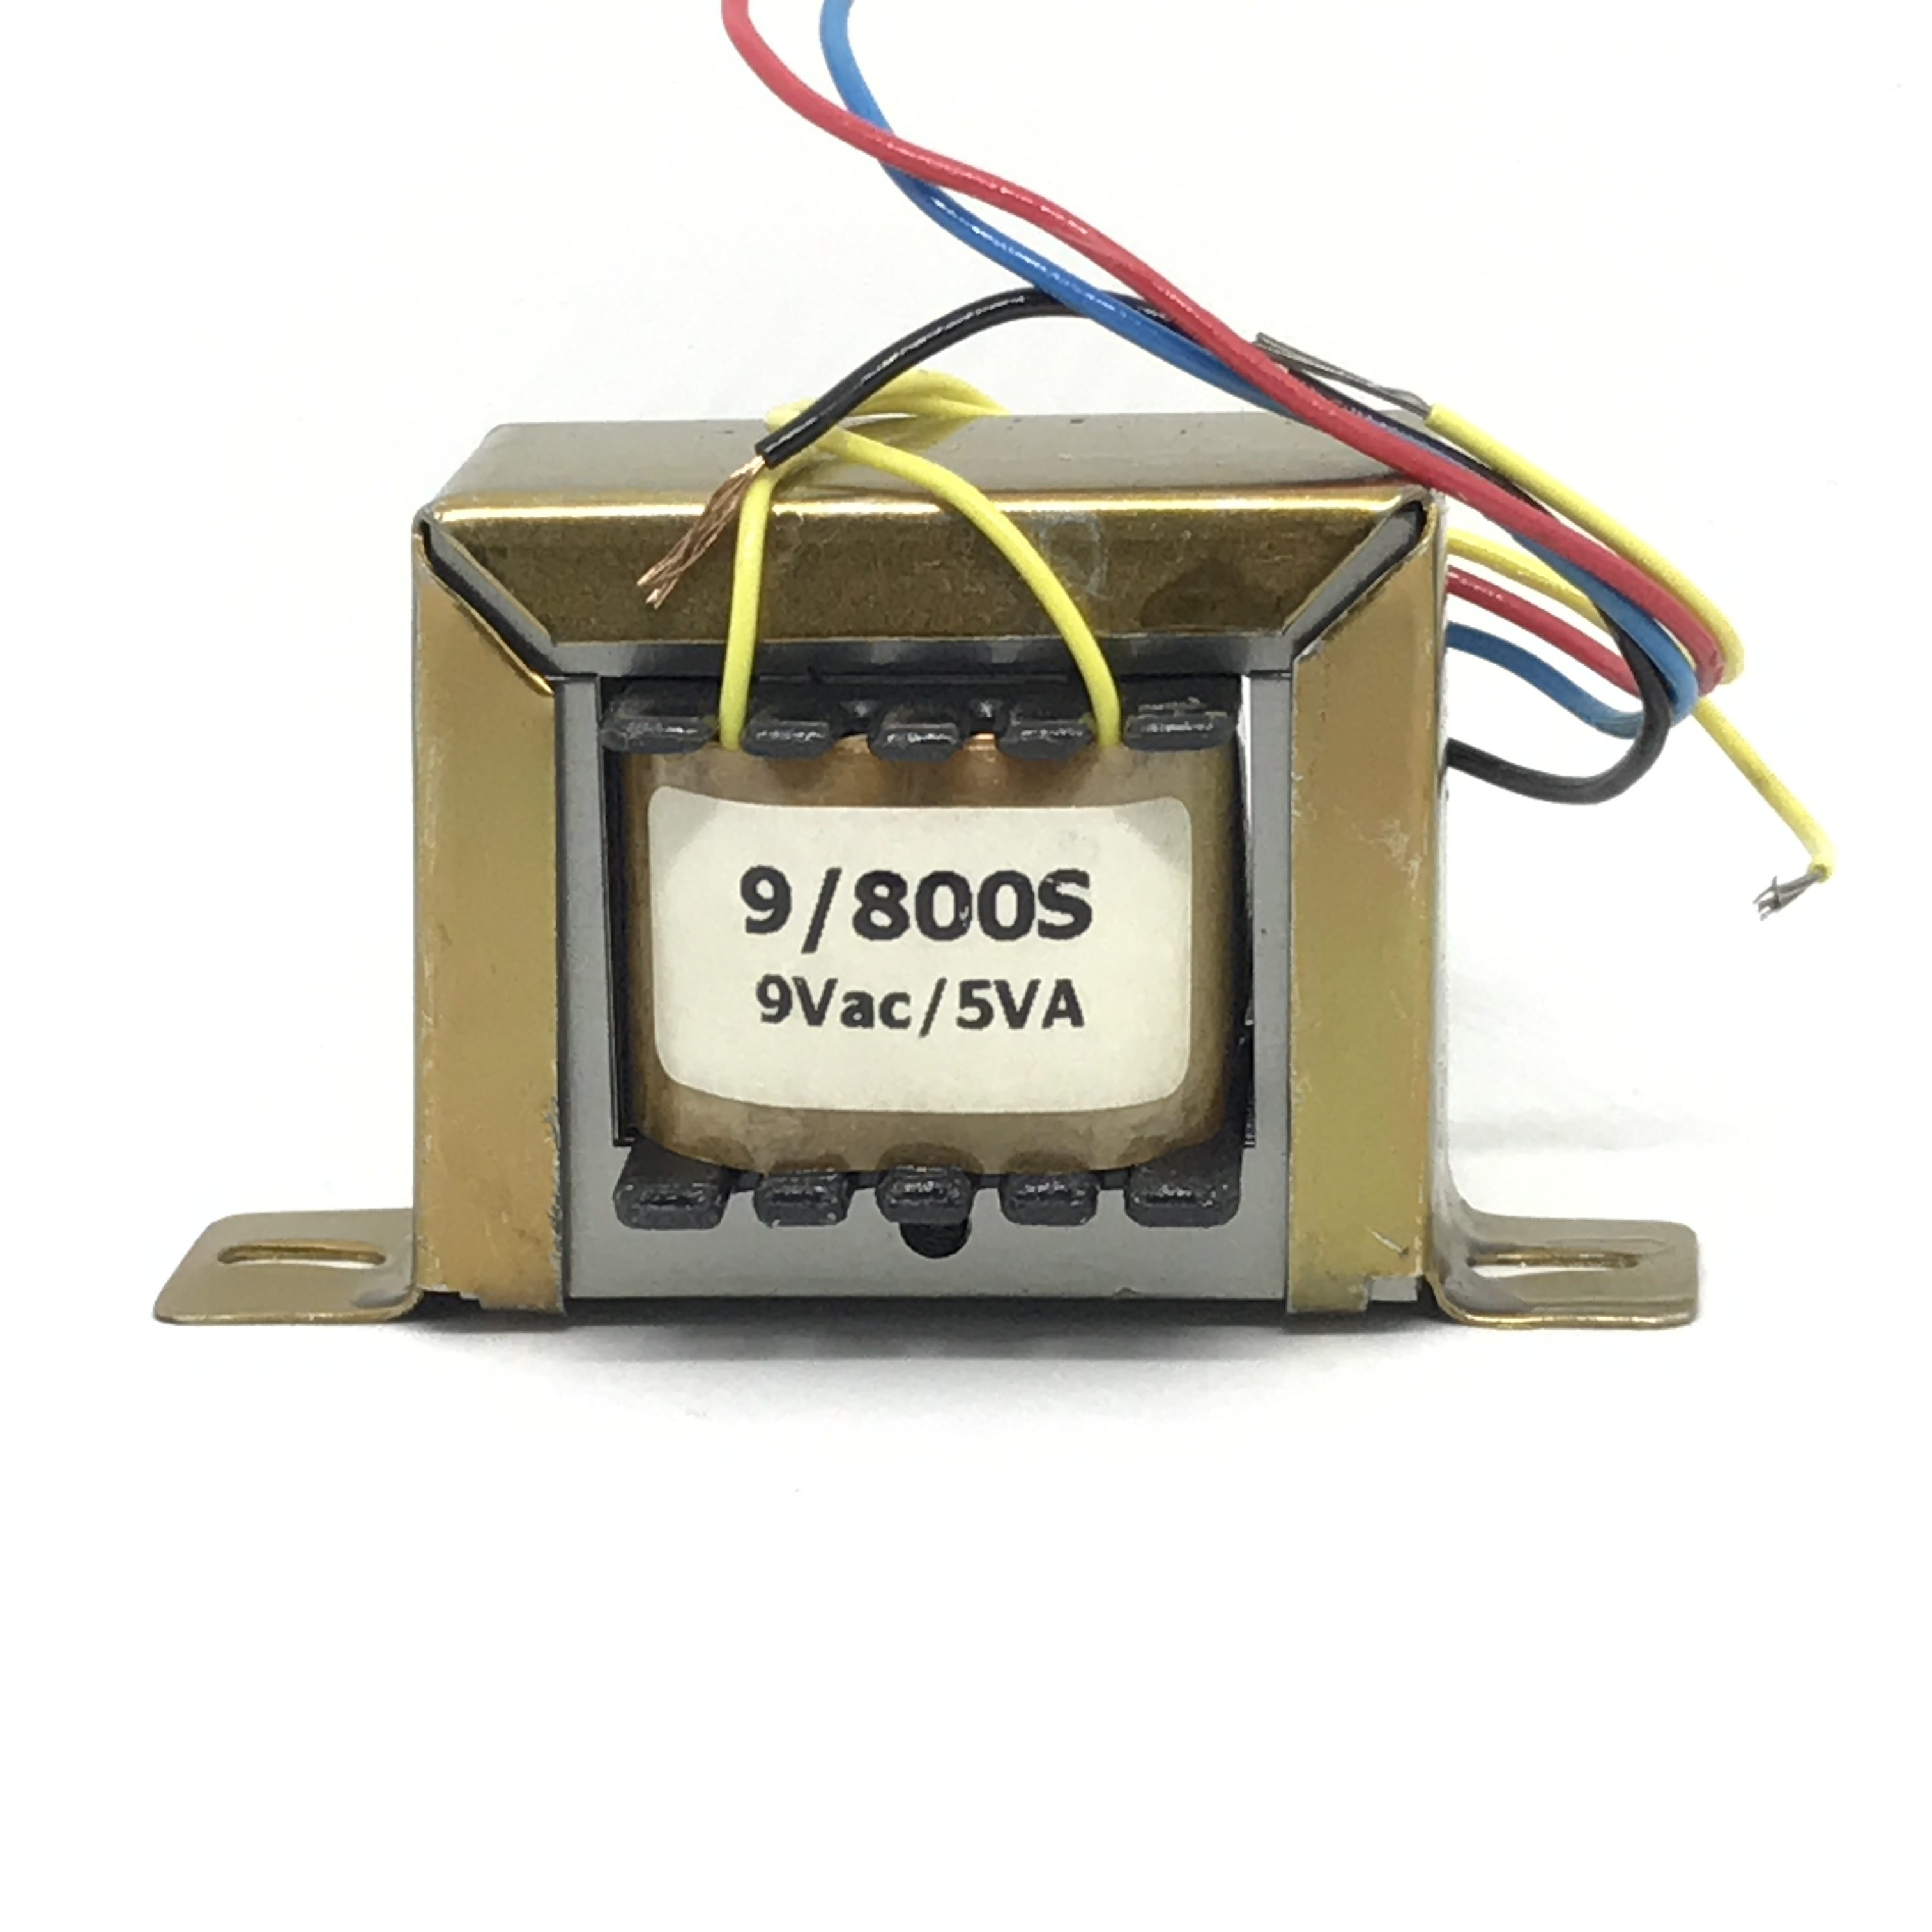 TRANSFORMADOR HAYAMA 9/800S – 9V, 800mA, Bivolt